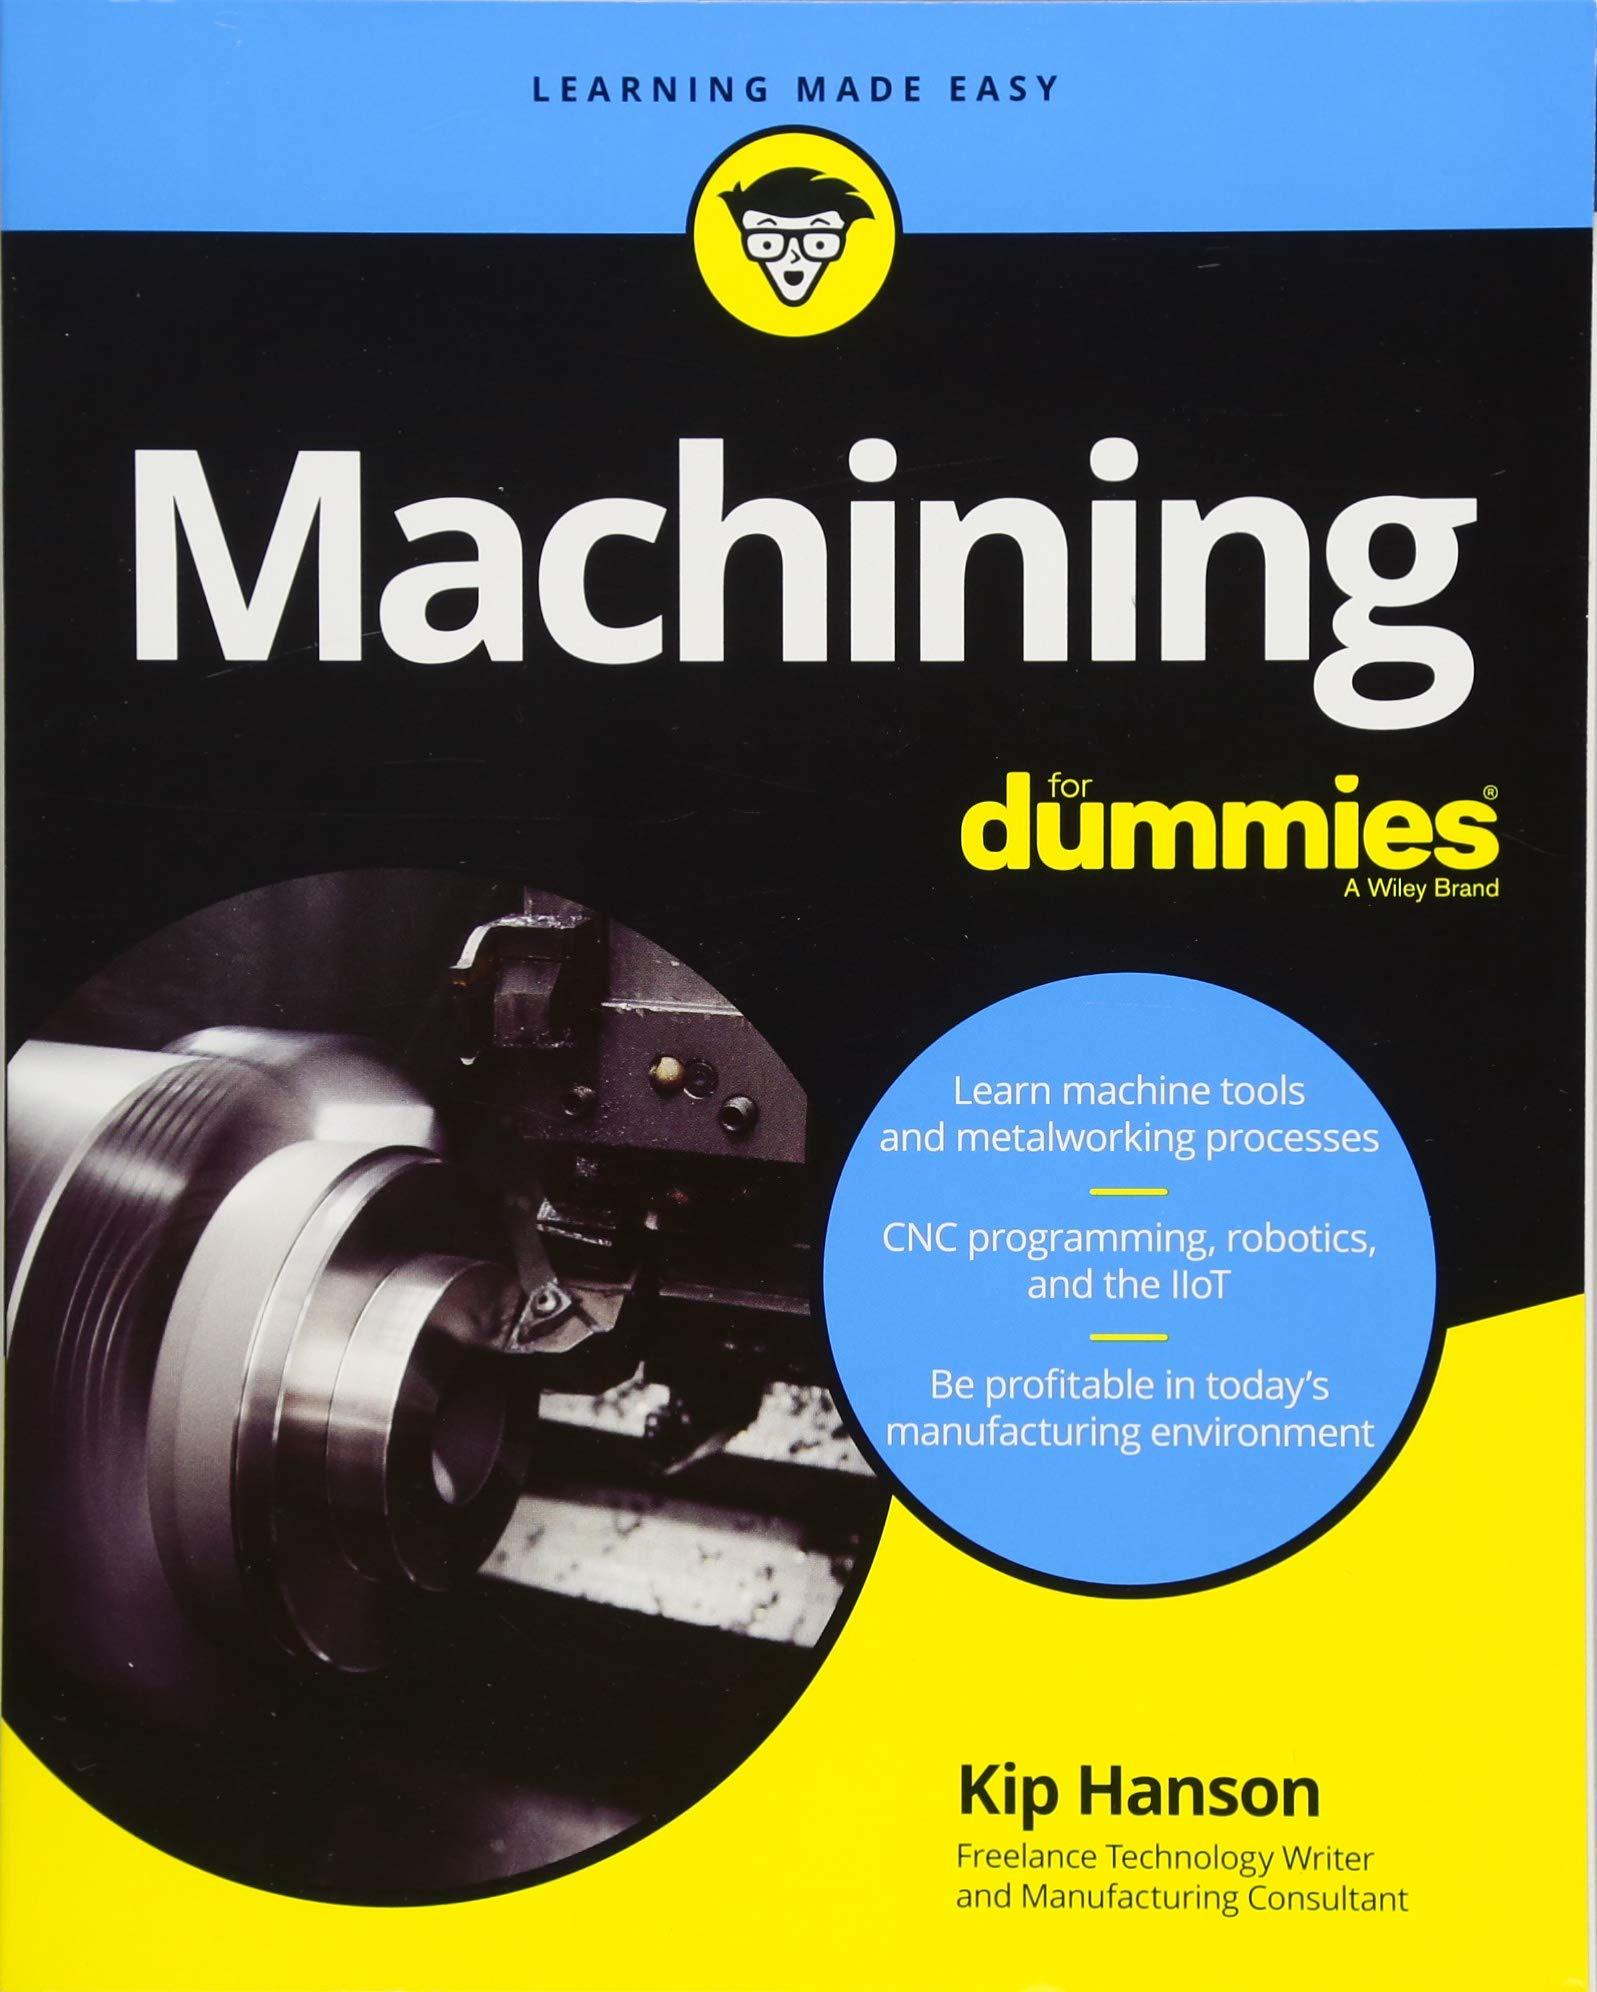 Machining For Dummies (For Dummies (Computer/Tech)): Kip Hanson:  9781119426134: Amazon.com: Books